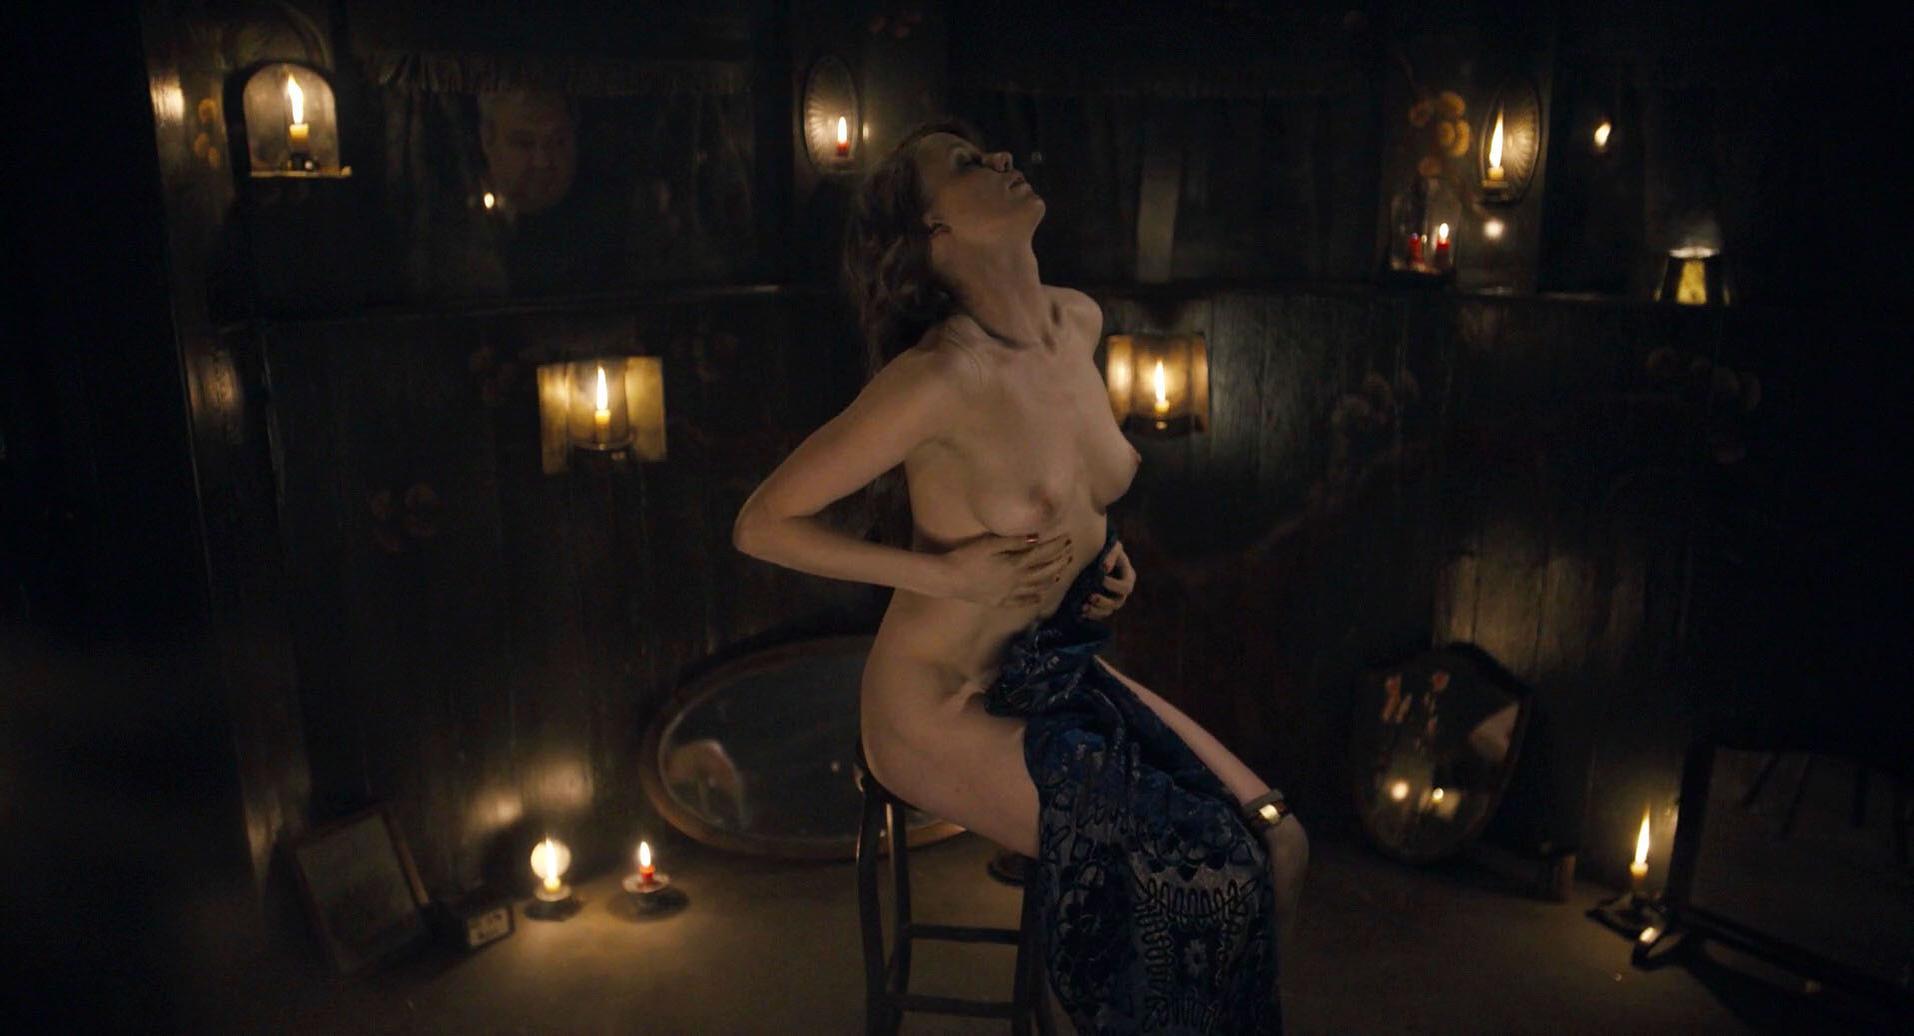 Cj miles porn video